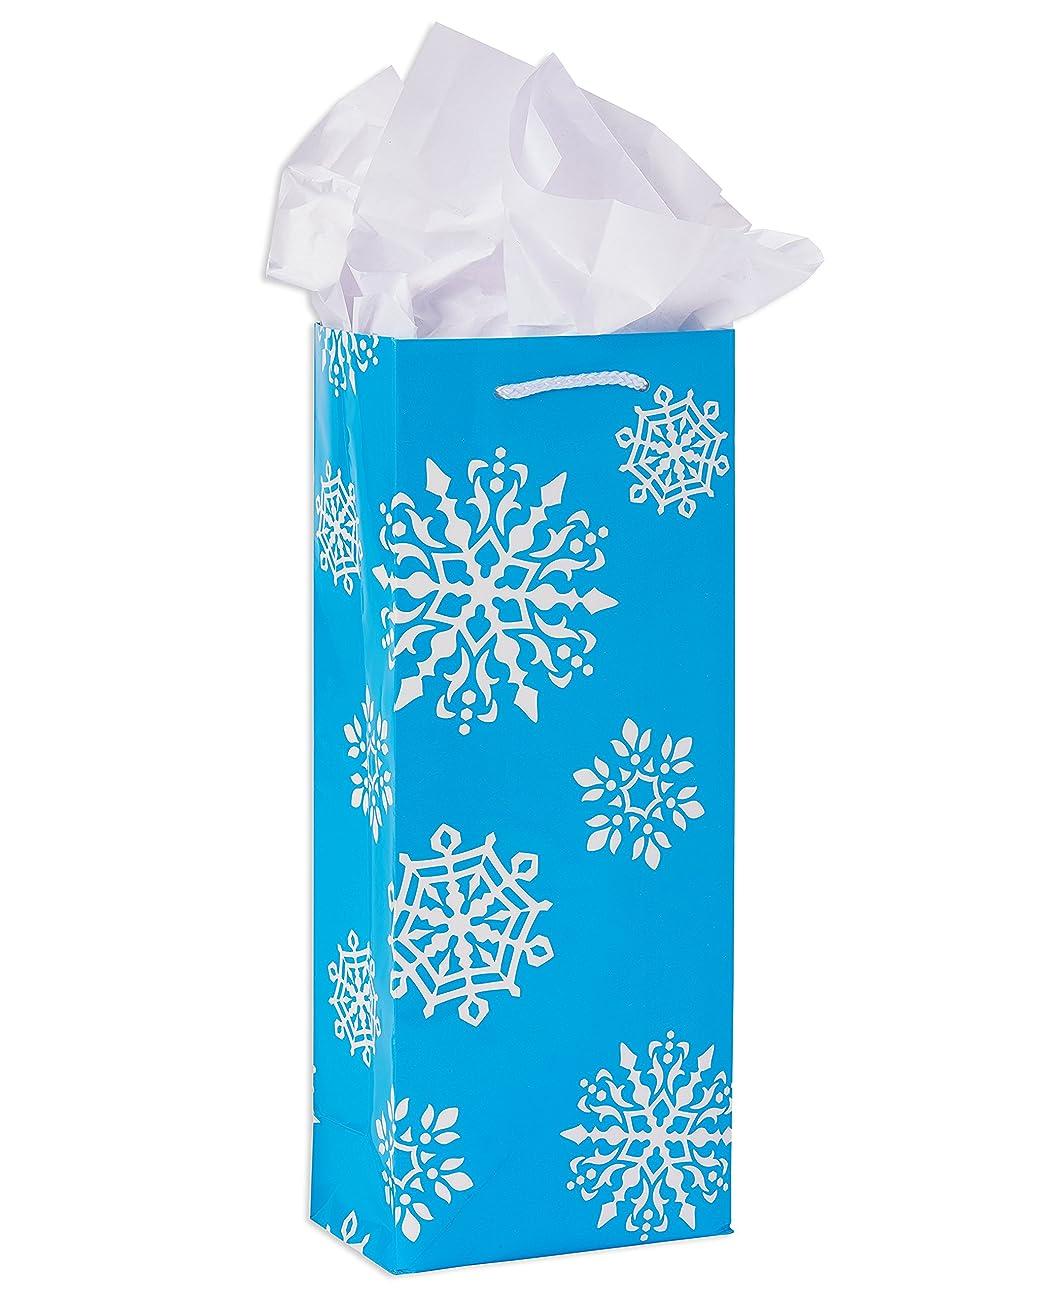 American Greetings Wine Winter Combo Snowflakes Gift Bag, Blue